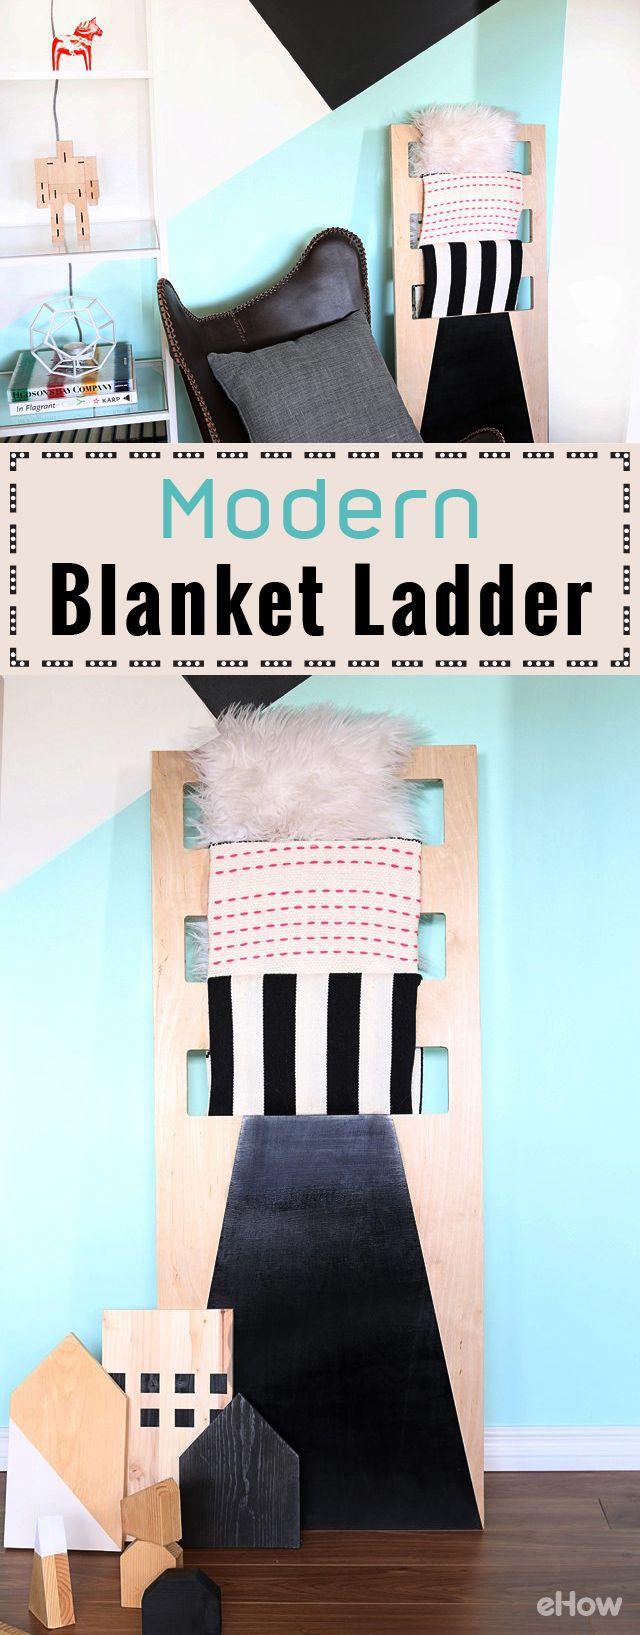 best ideas about modern blankets on pinterest  crochet  - diy modern blanket ladder